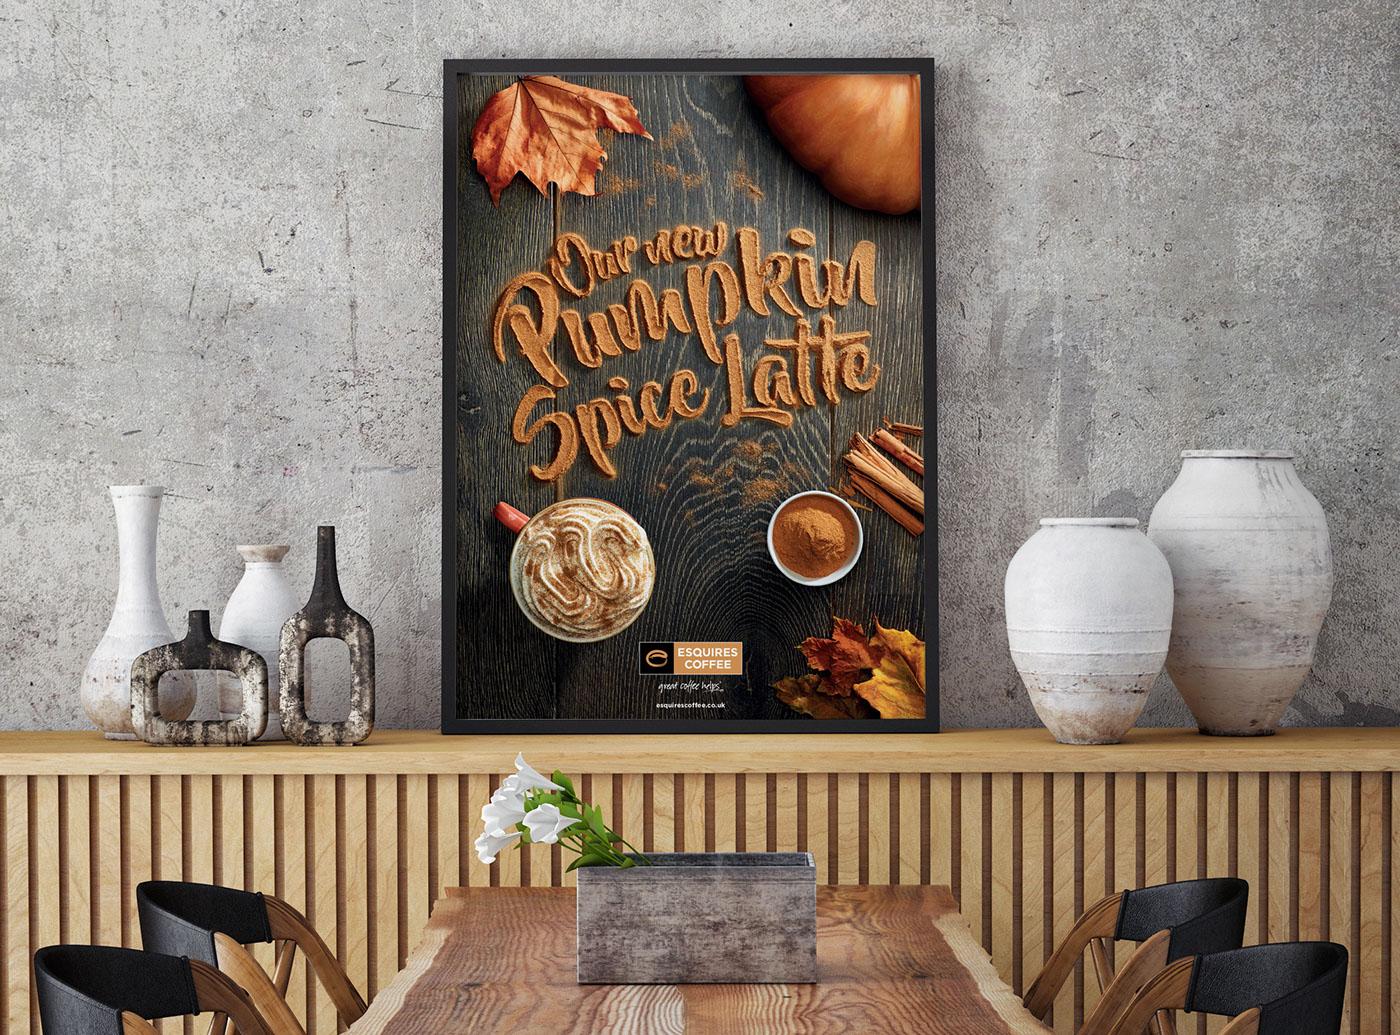 Pumpkin Spice Latte promotion